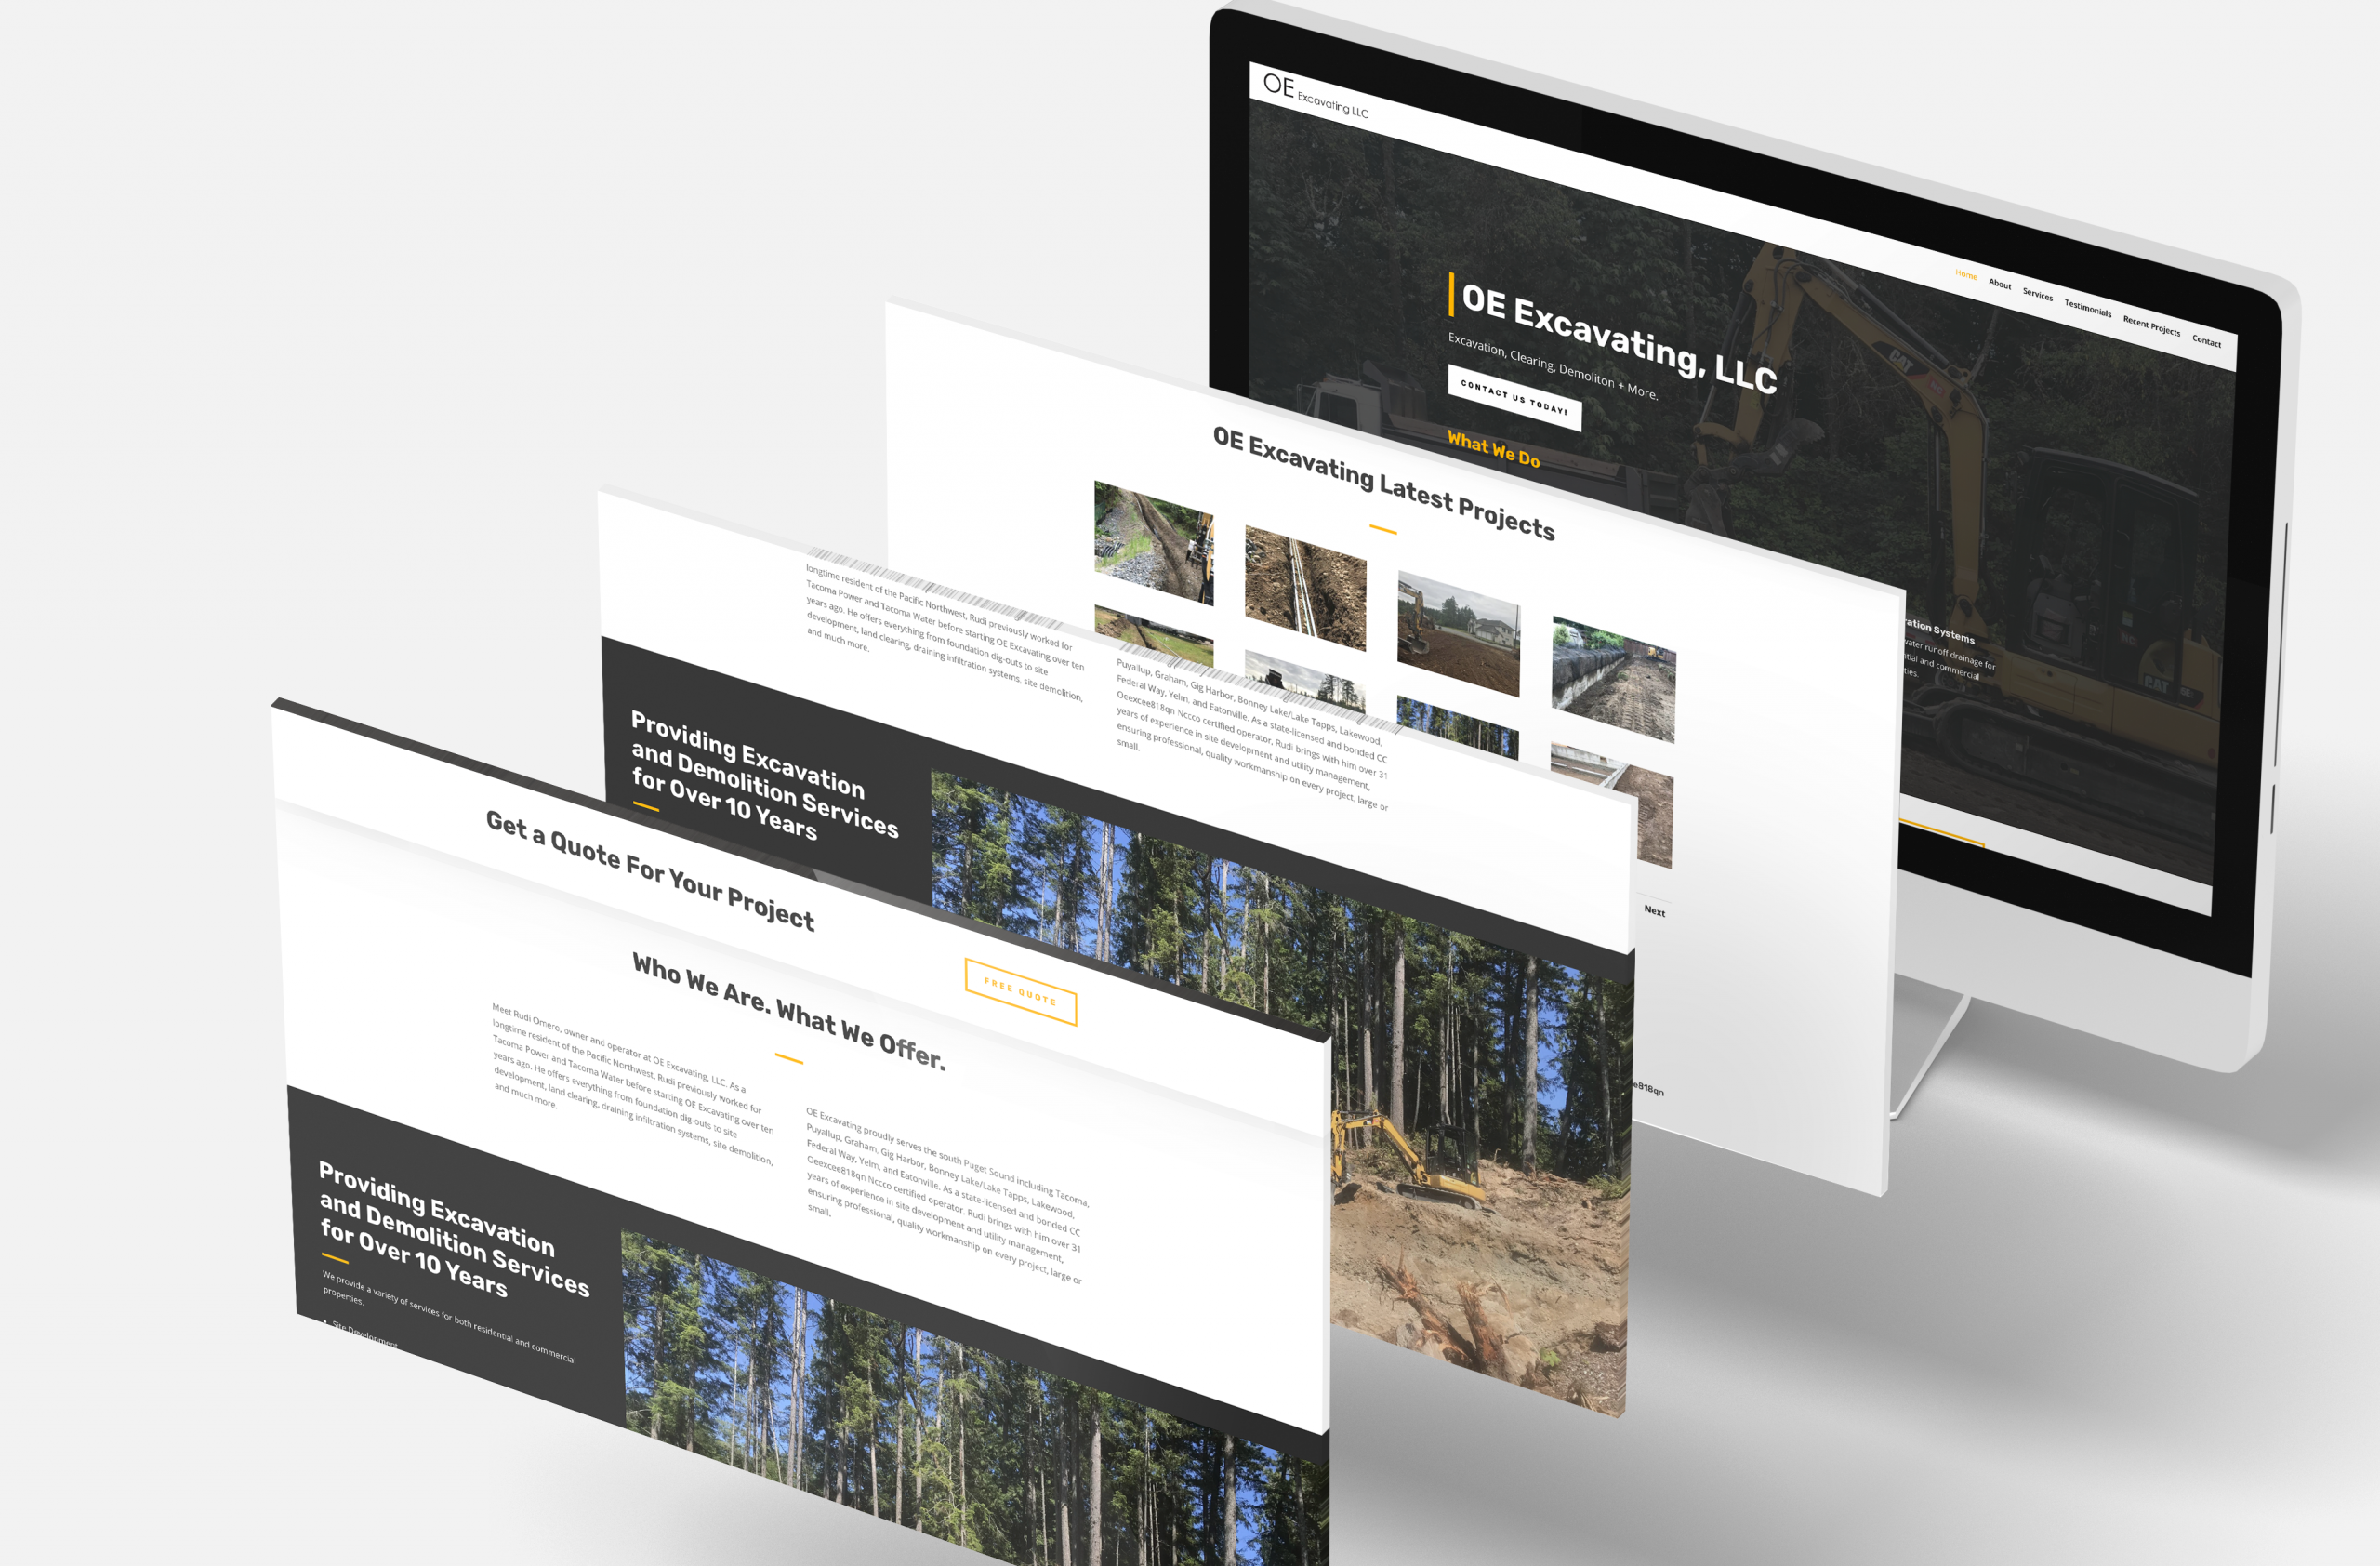 OE Excavating Website built using the divi platform